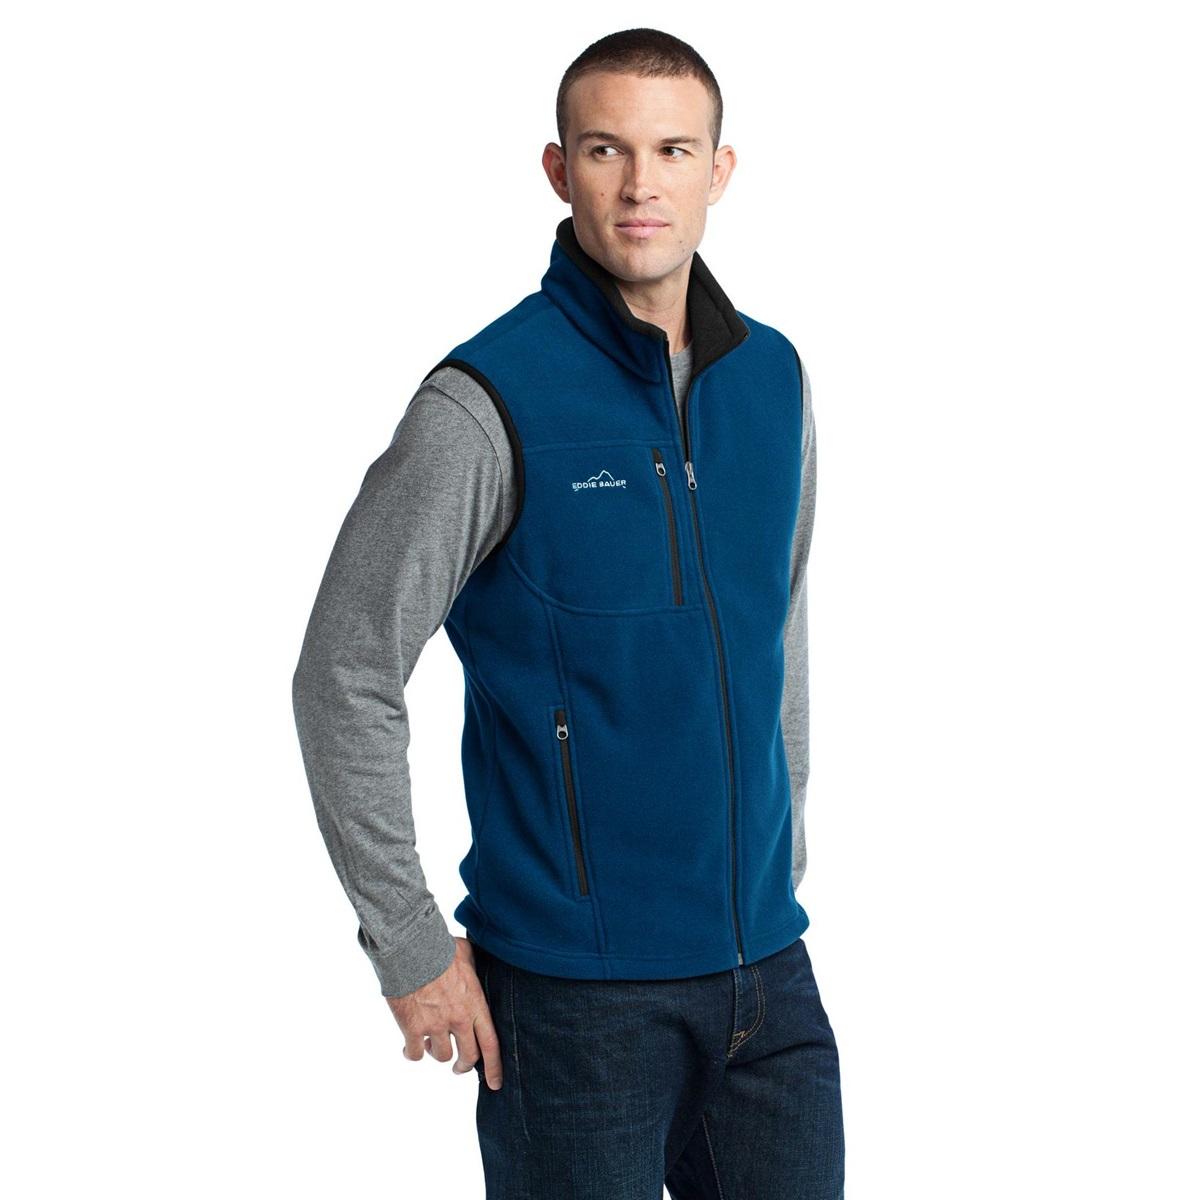 bauer eddie vest fleece sea deep crestline fullsource